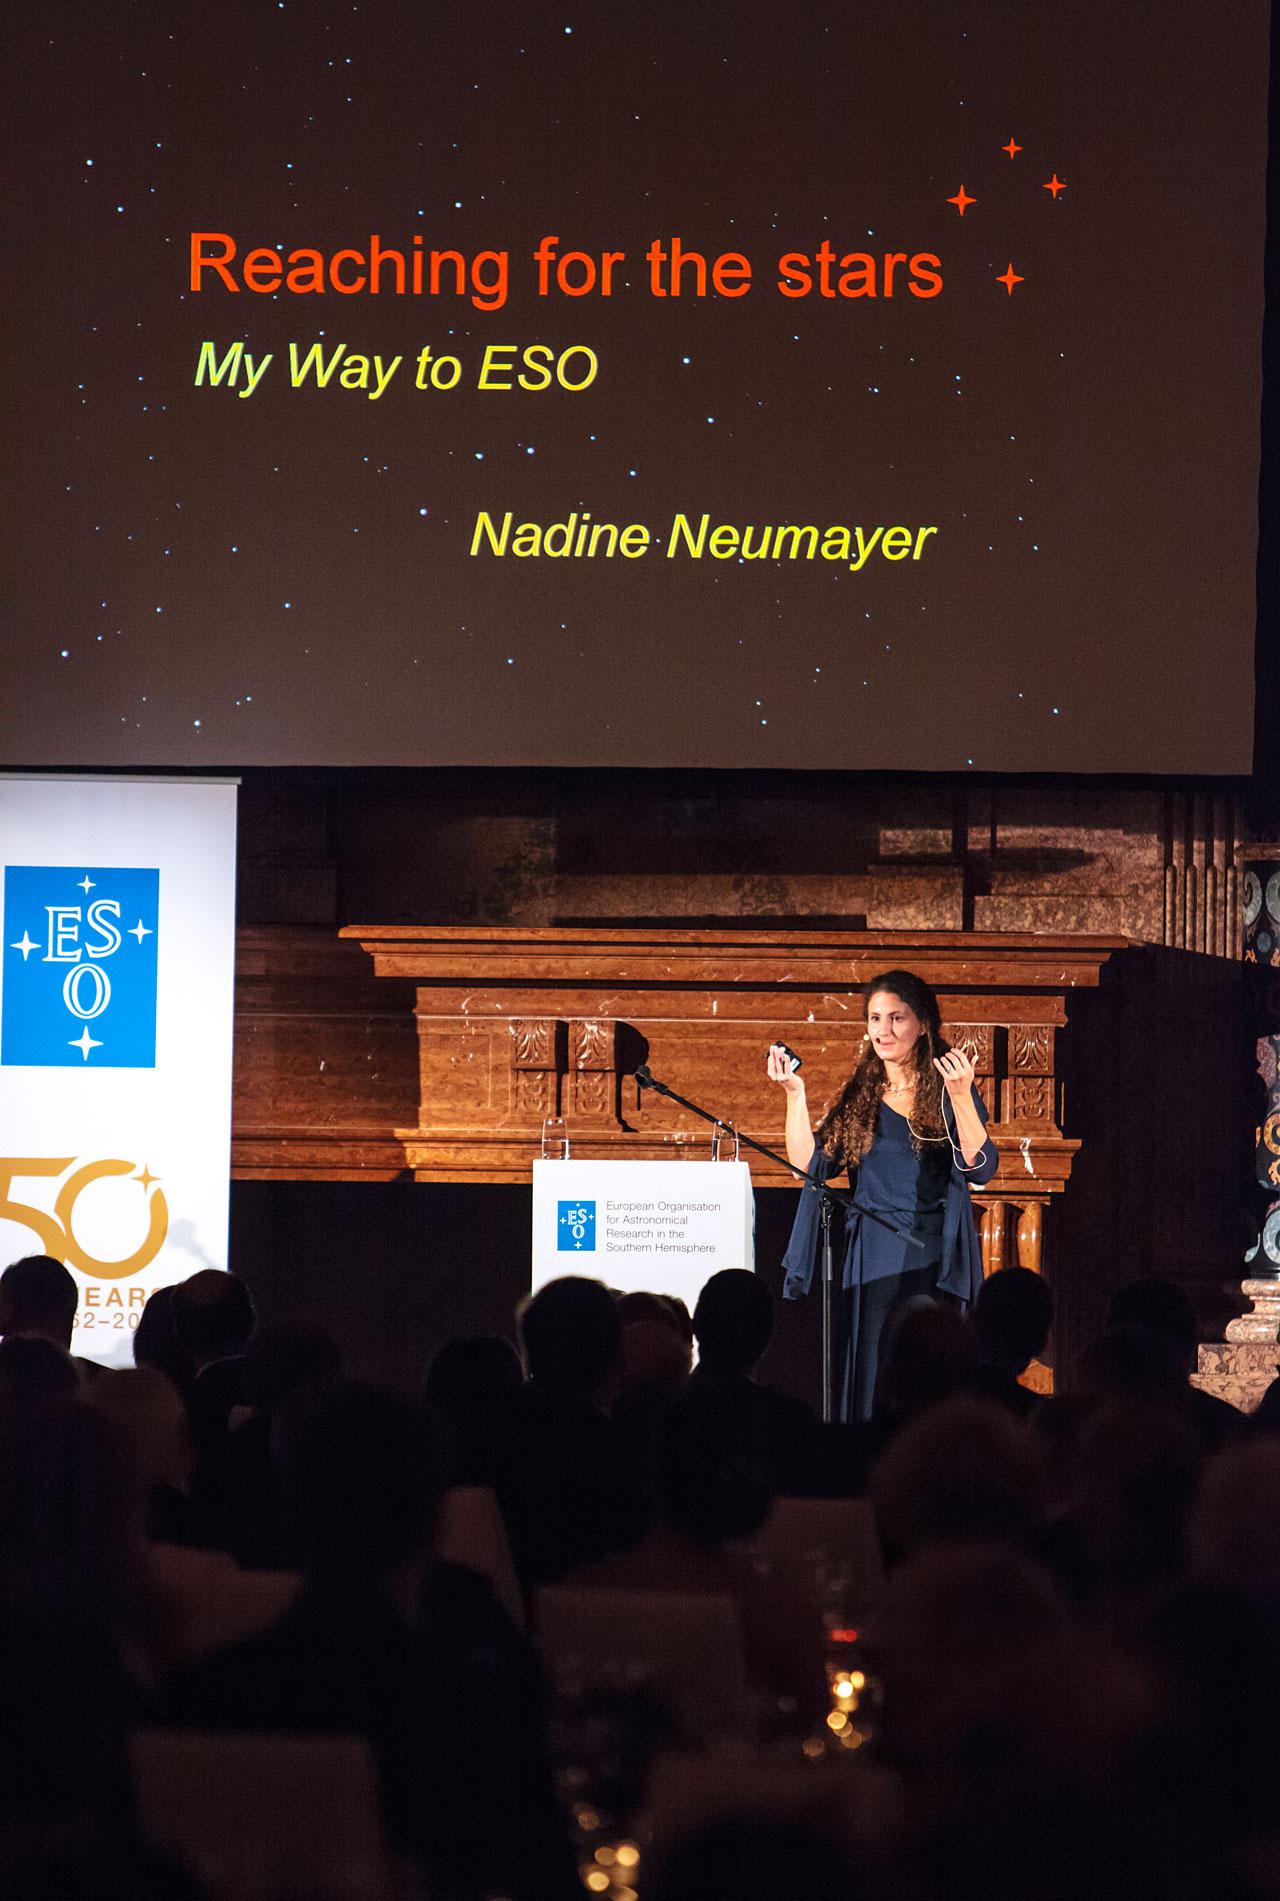 Nadine Neumayer at the ESO 50th Anniversary Gala Event